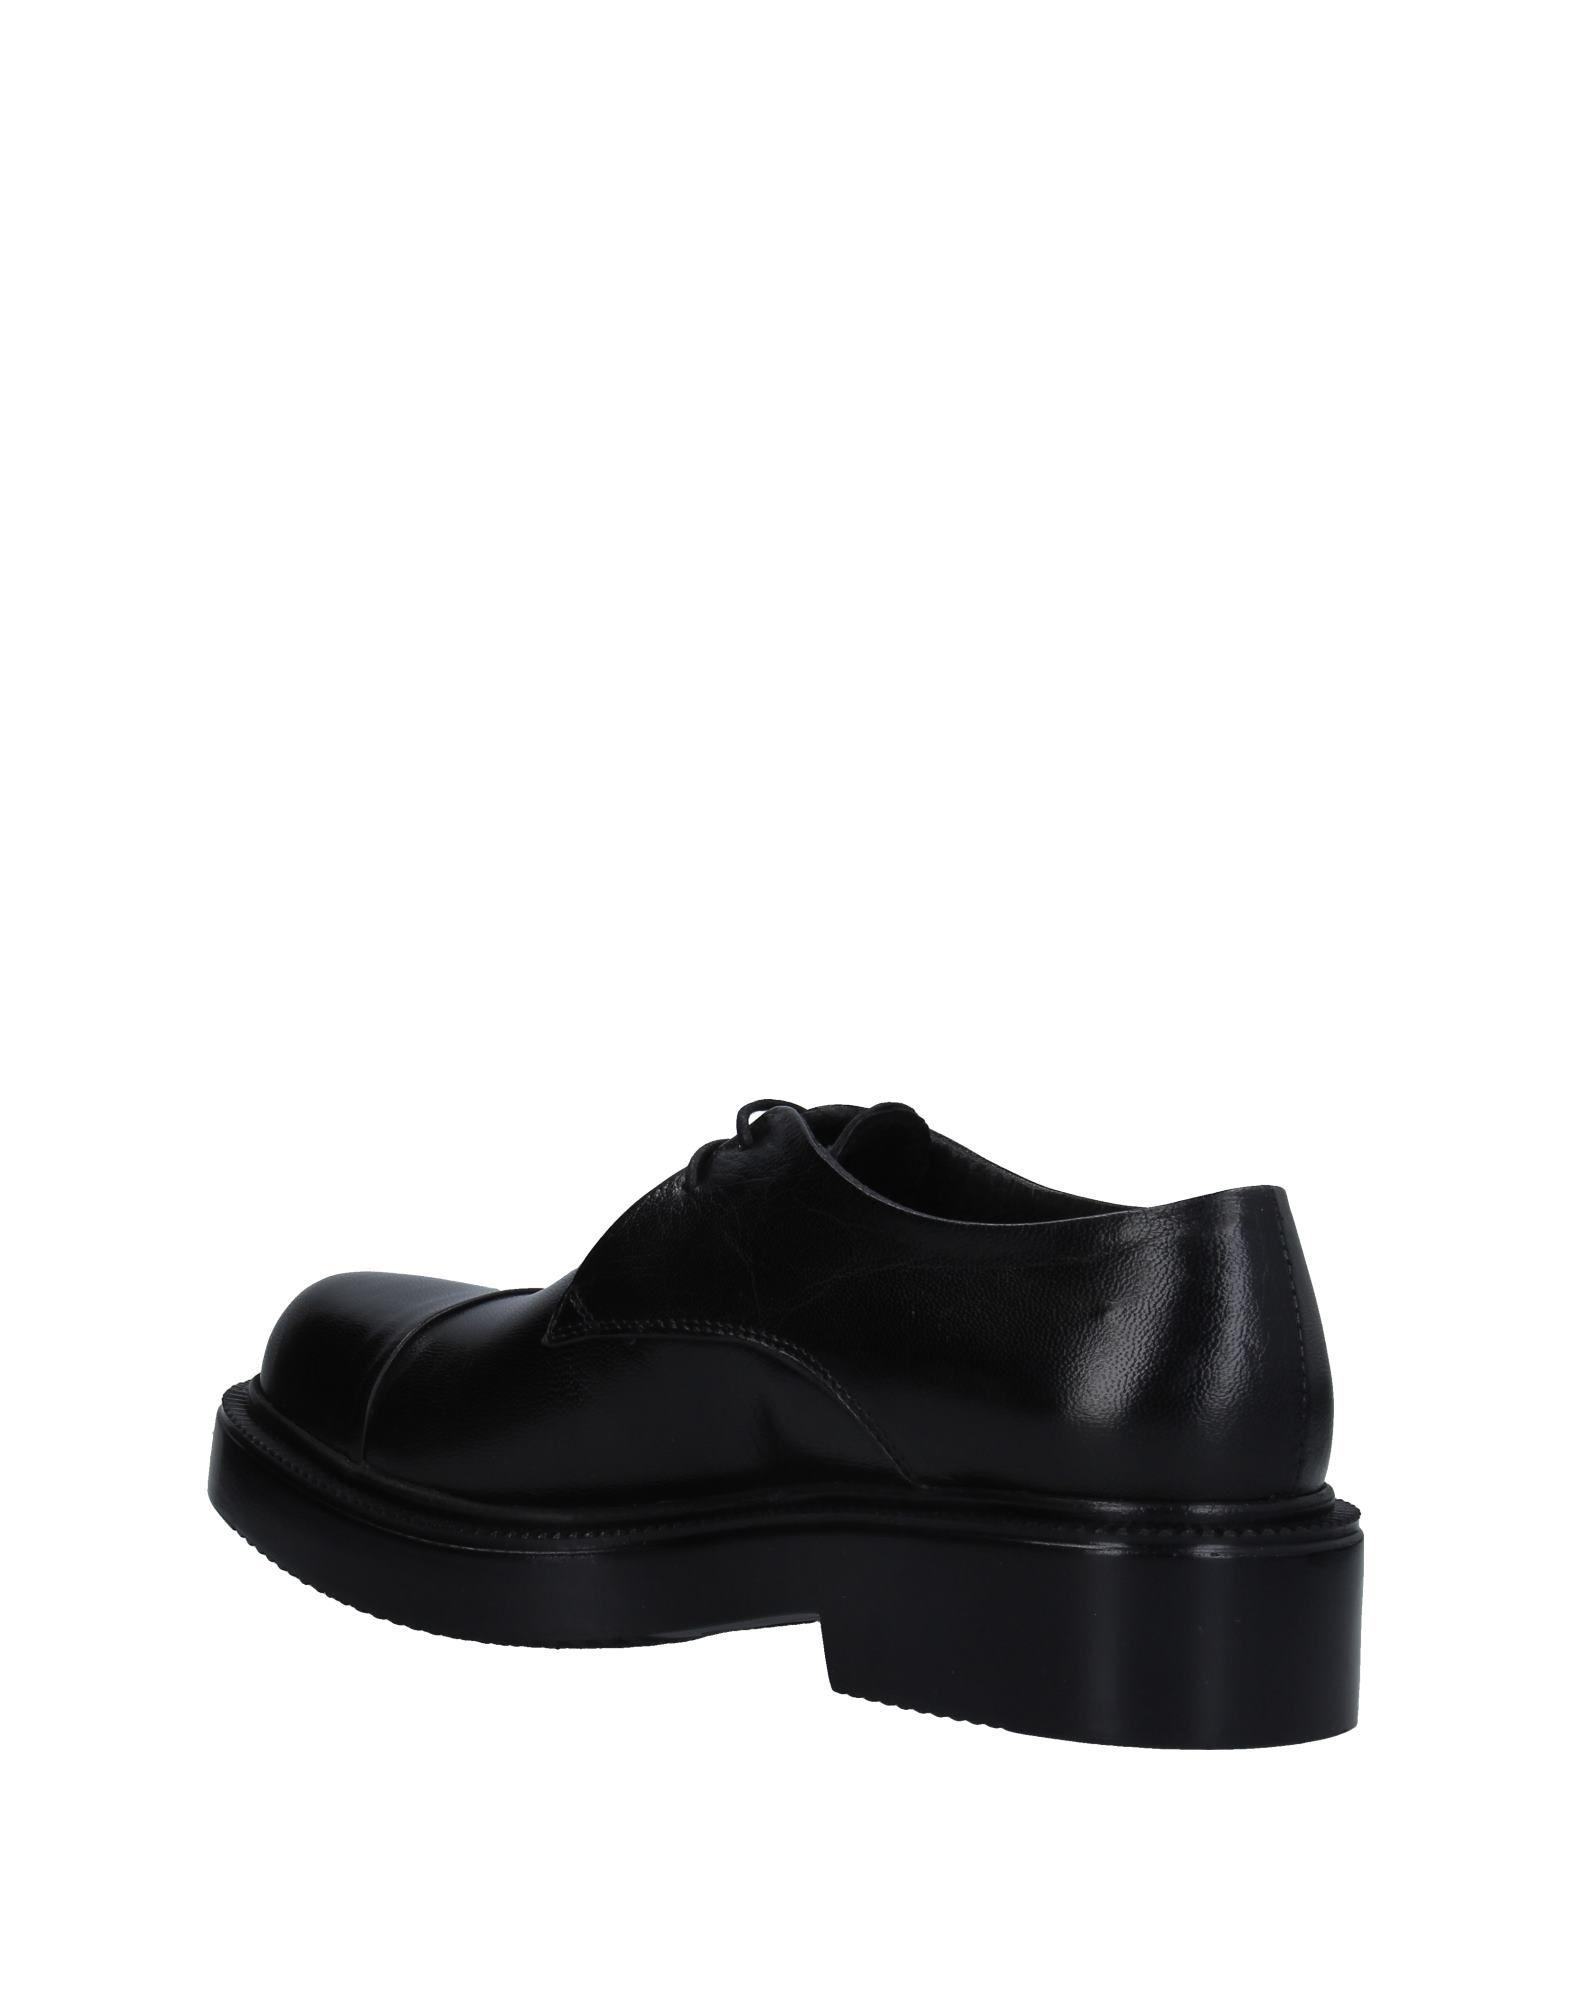 Unlace Schnürschuhe Damen  11285260KM Gute Qualität beliebte Schuhe Schuhe Schuhe e84dc9